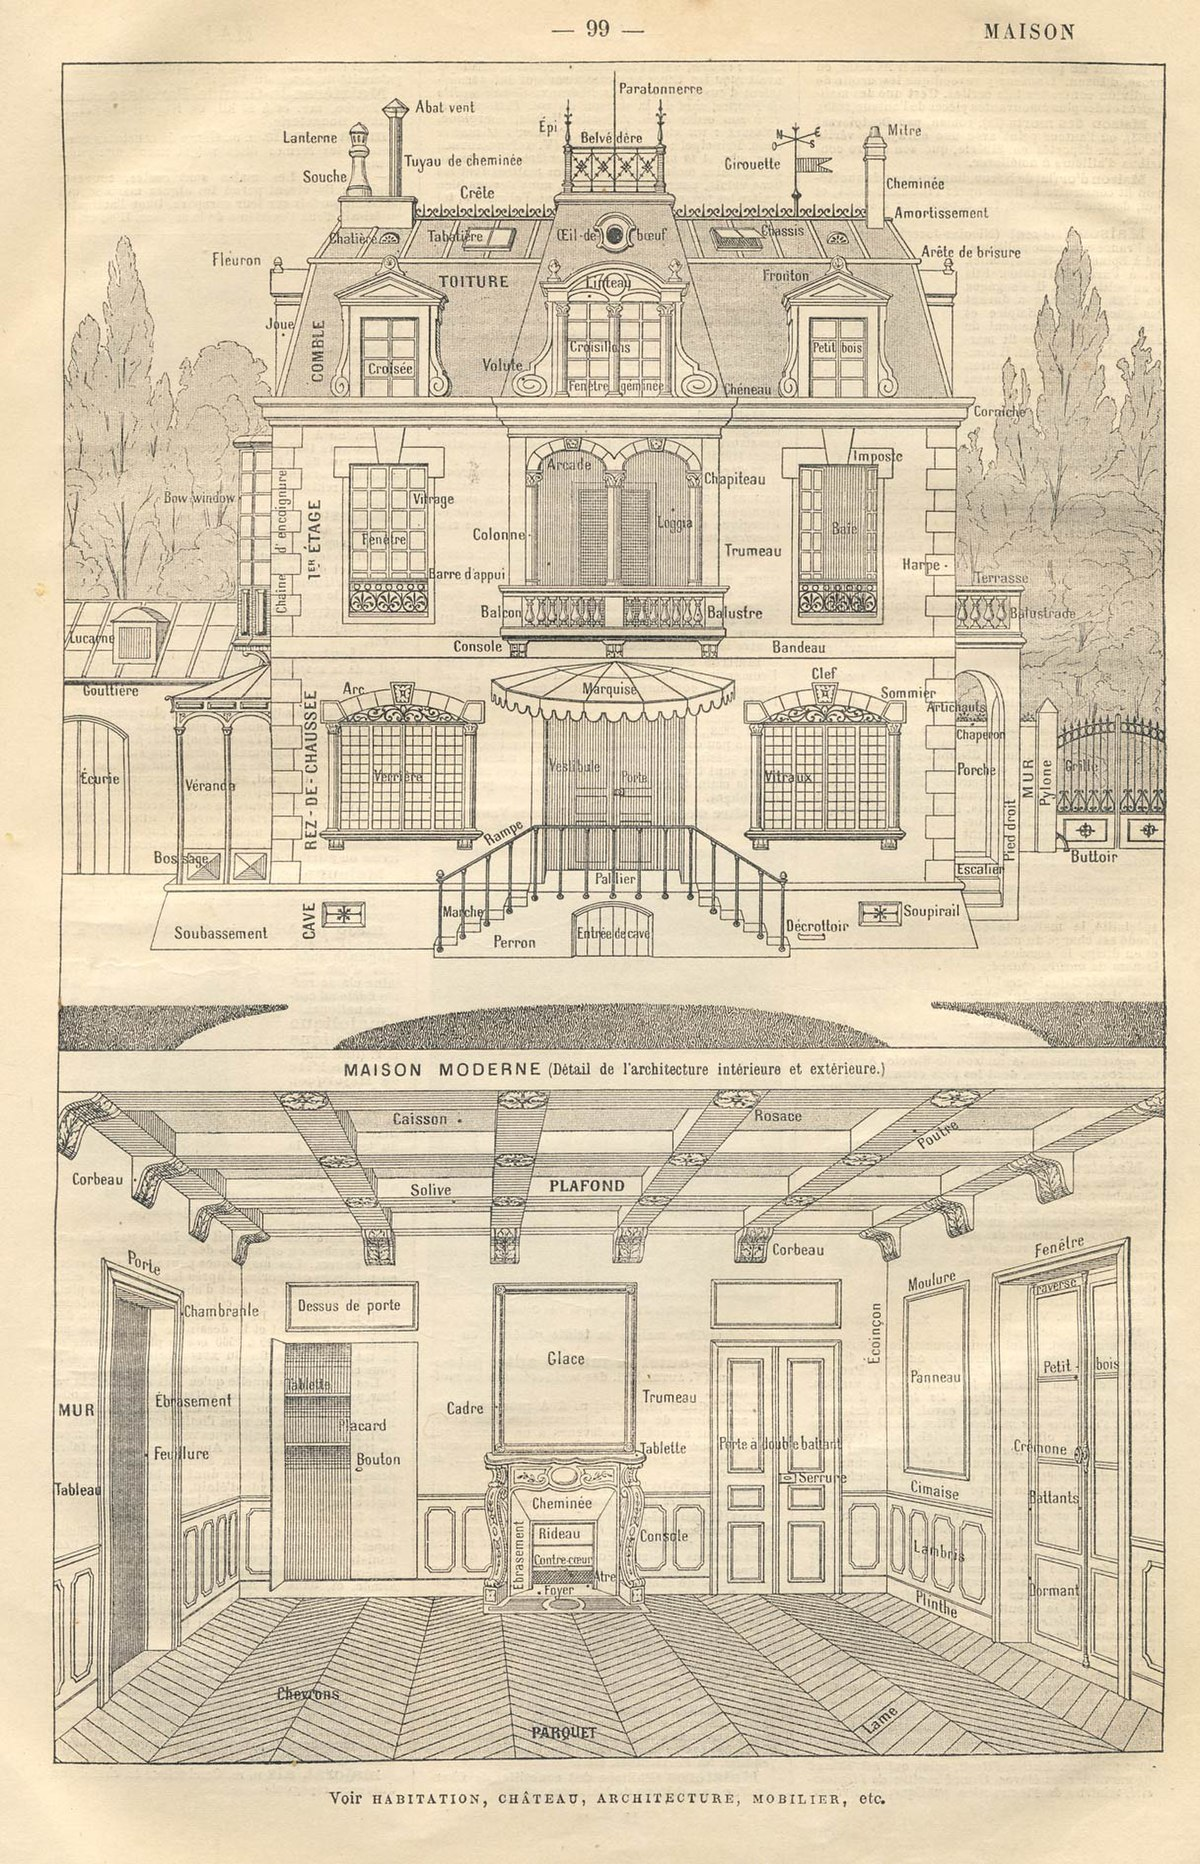 Image De Maison Moderne file:maison-moderne-larousse-1905 - wikimedia commons